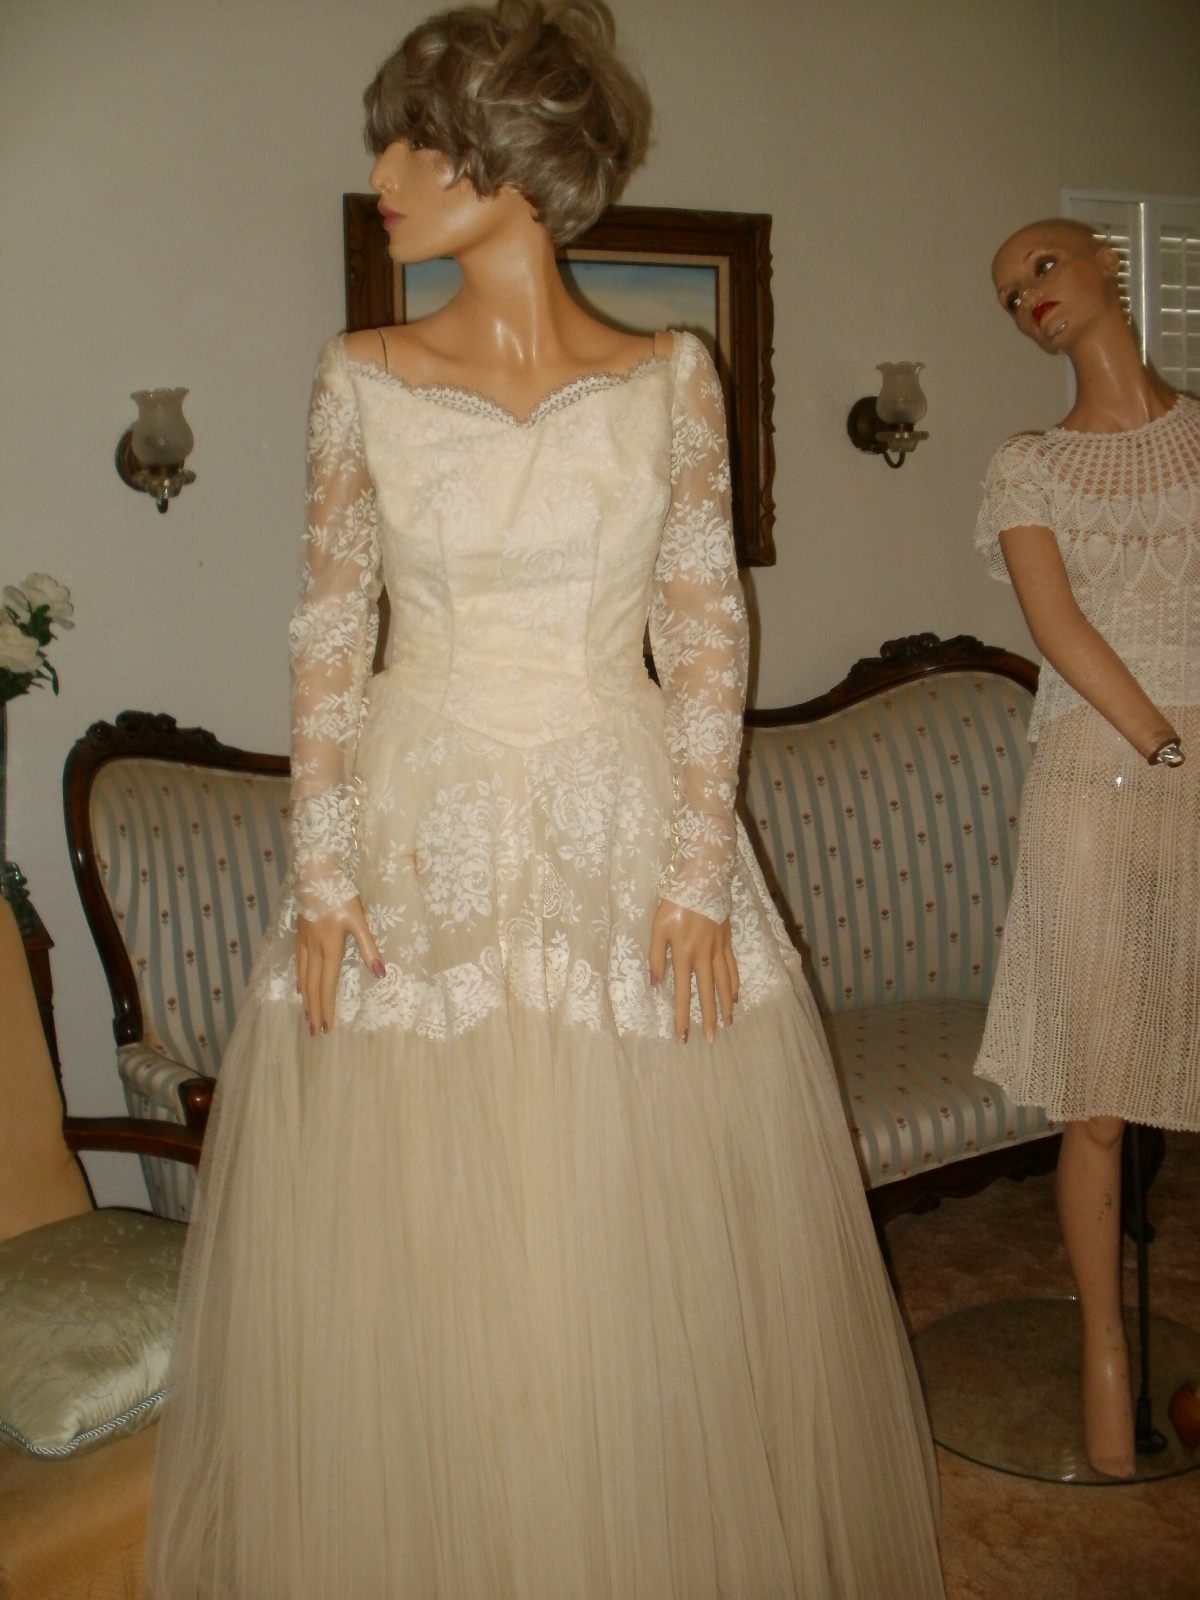 thrift shop wedding dresses photo - 1